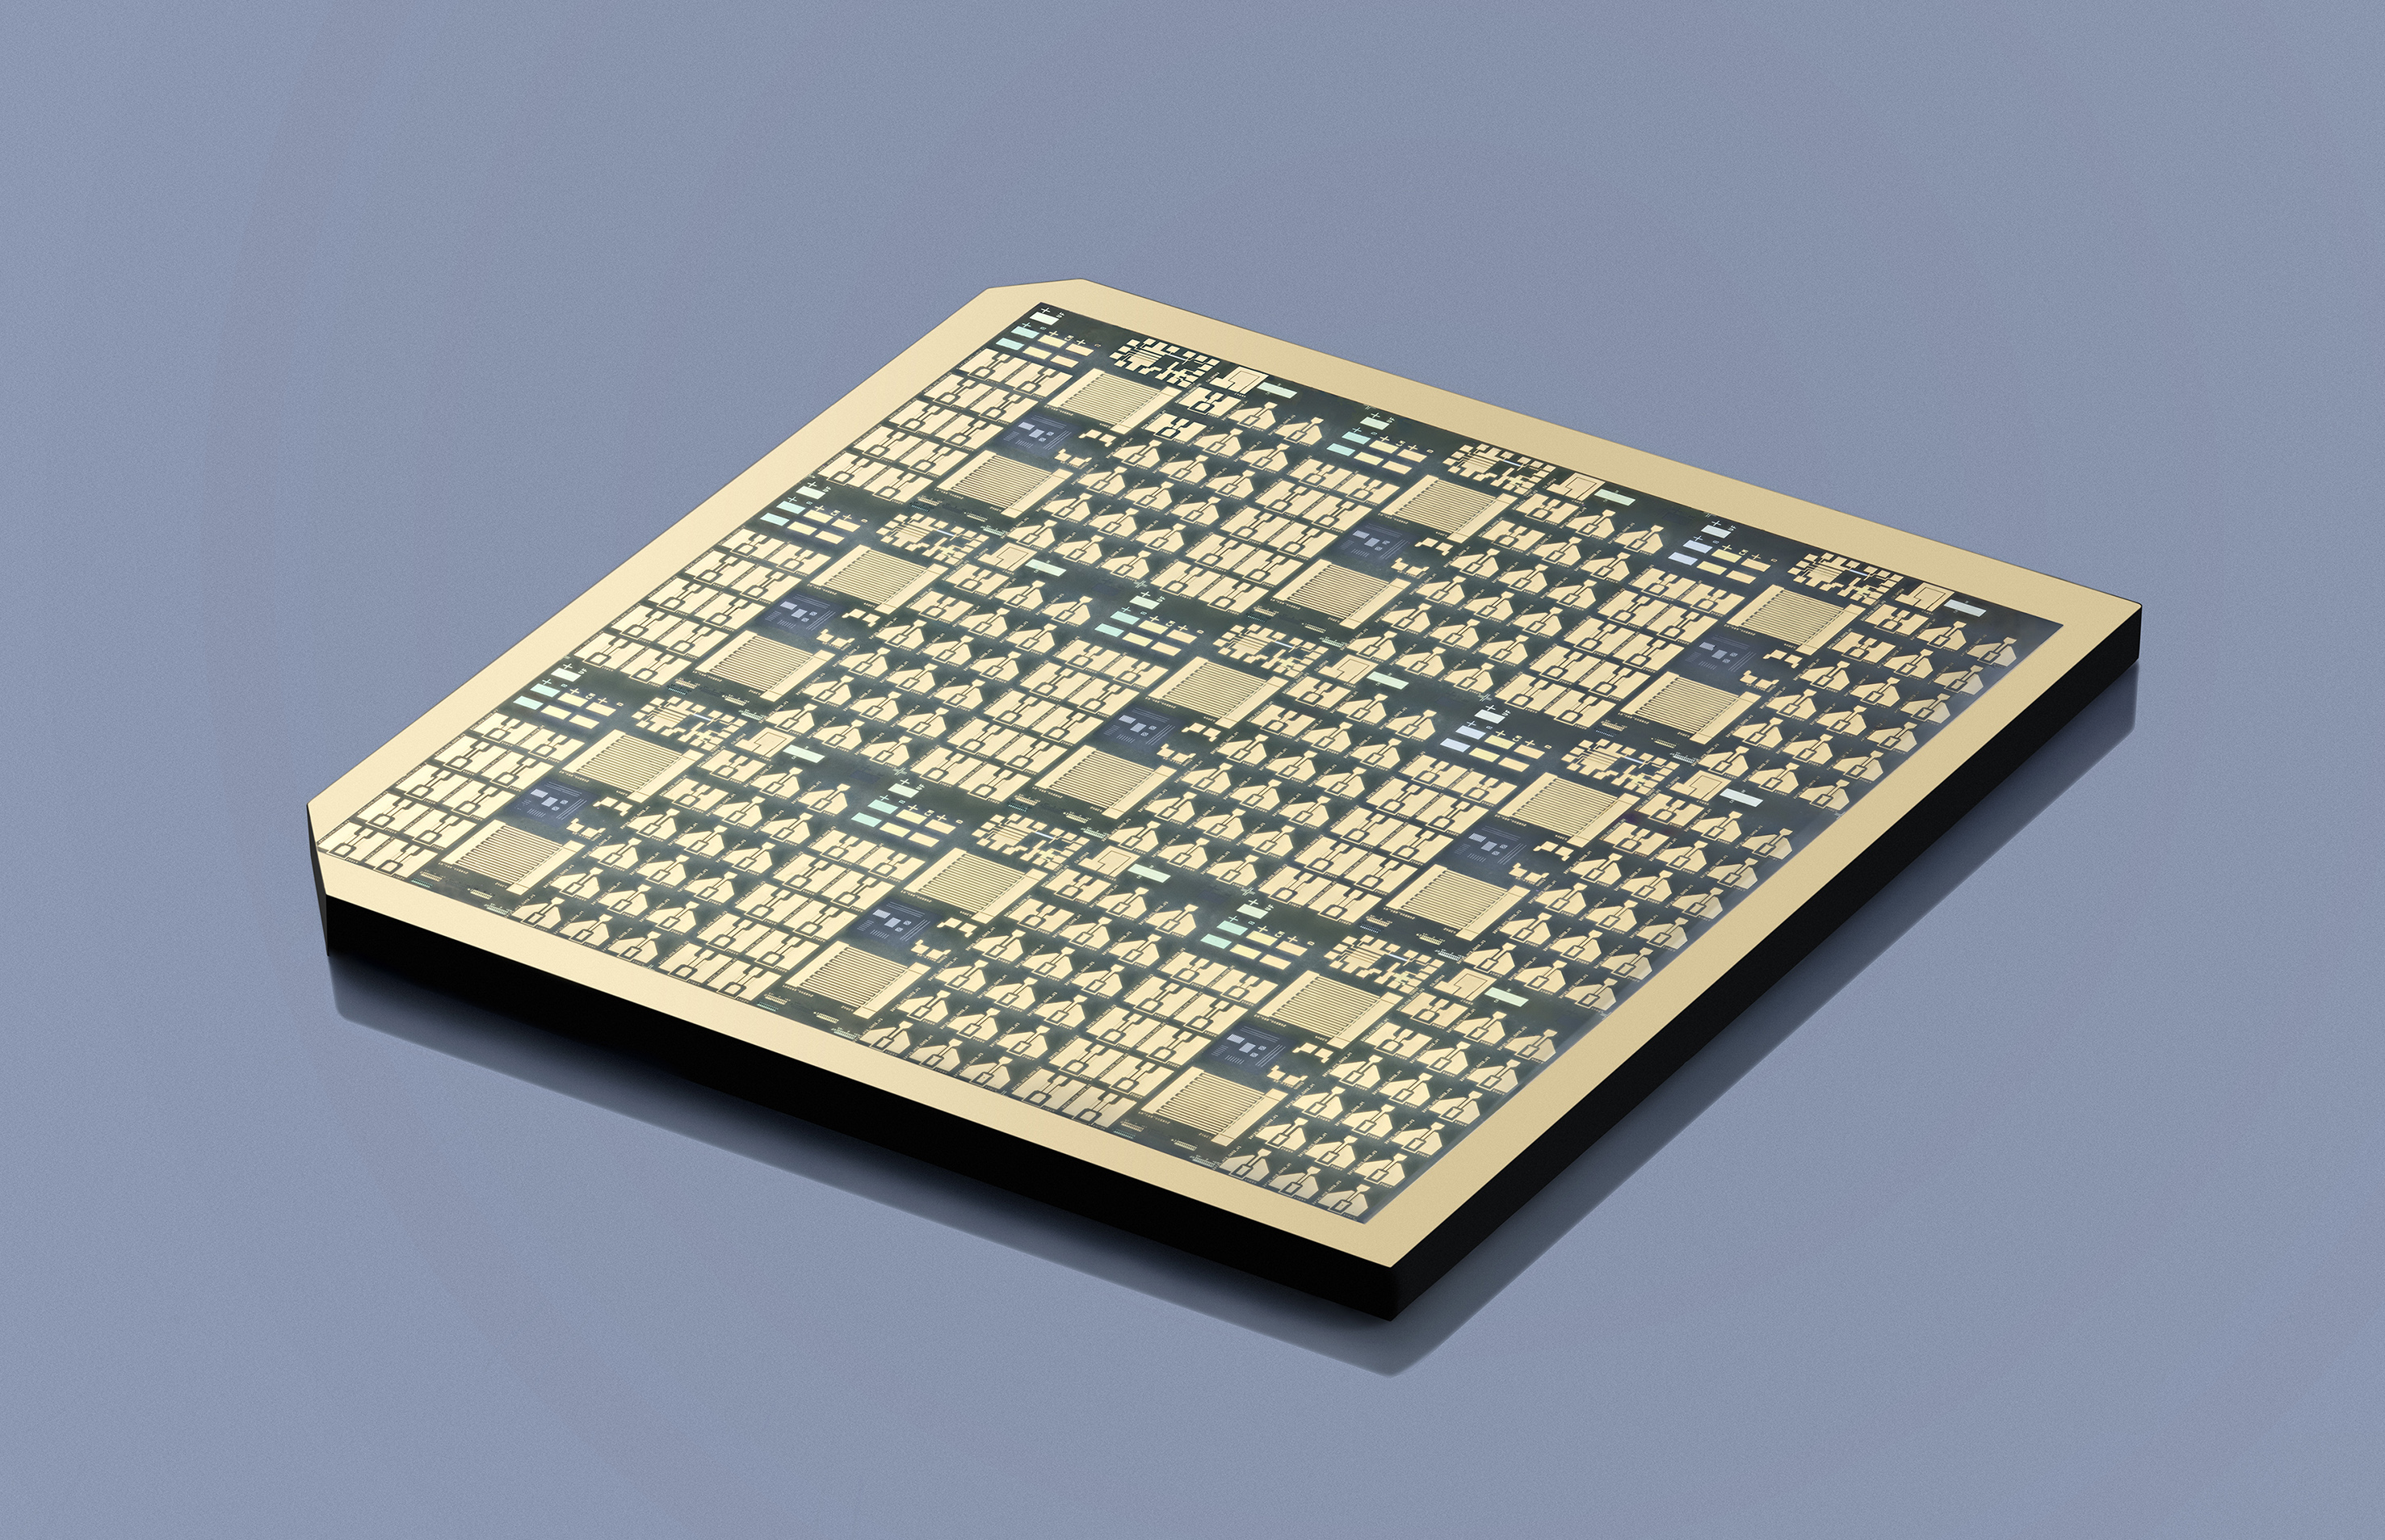 Energy-efficient power electronics – gallium oxide power transistors with record values